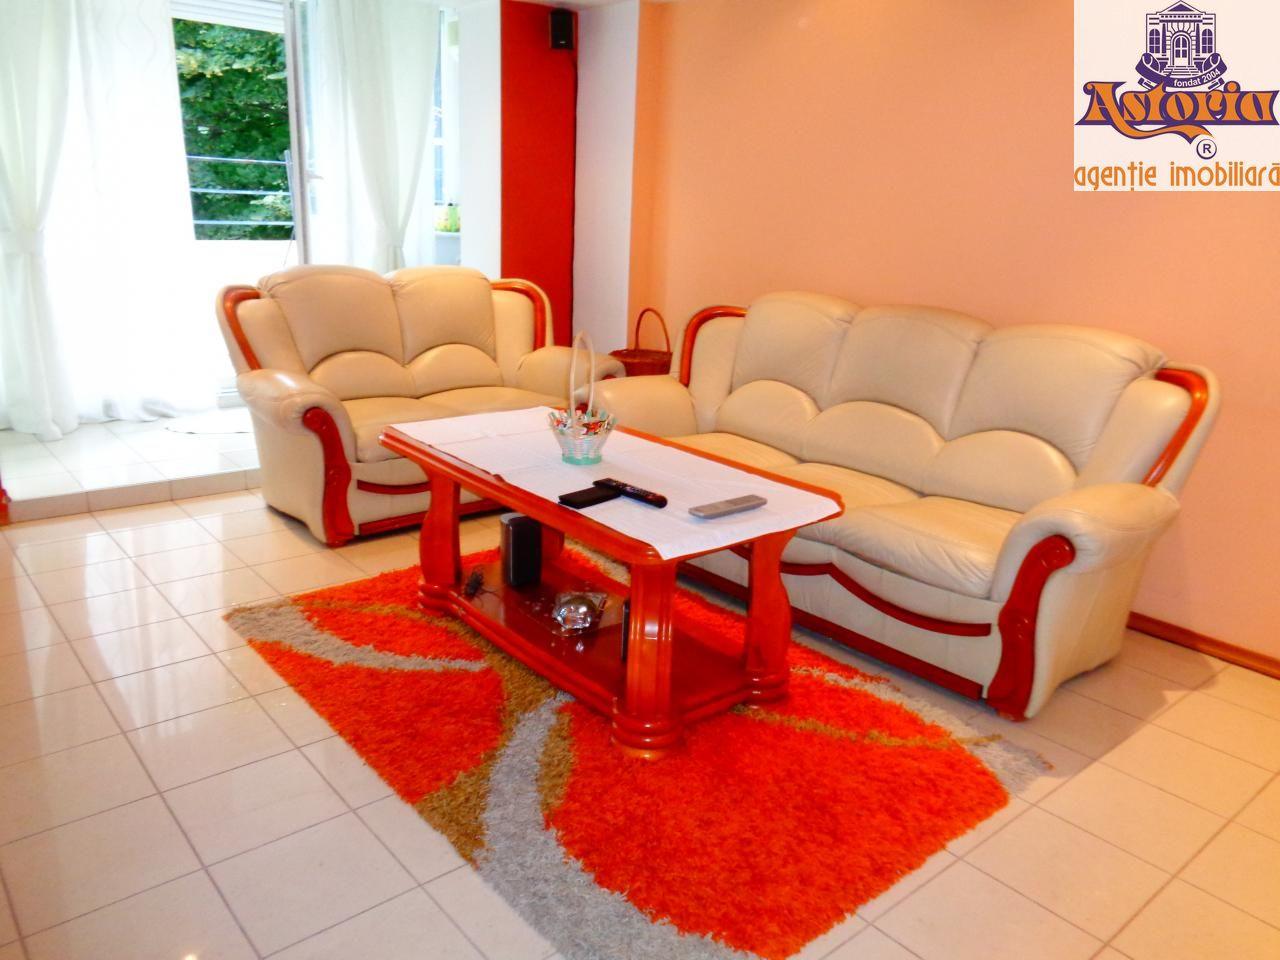 Apartament de vanzare, Pitesti, Arges, Banat - Foto 1